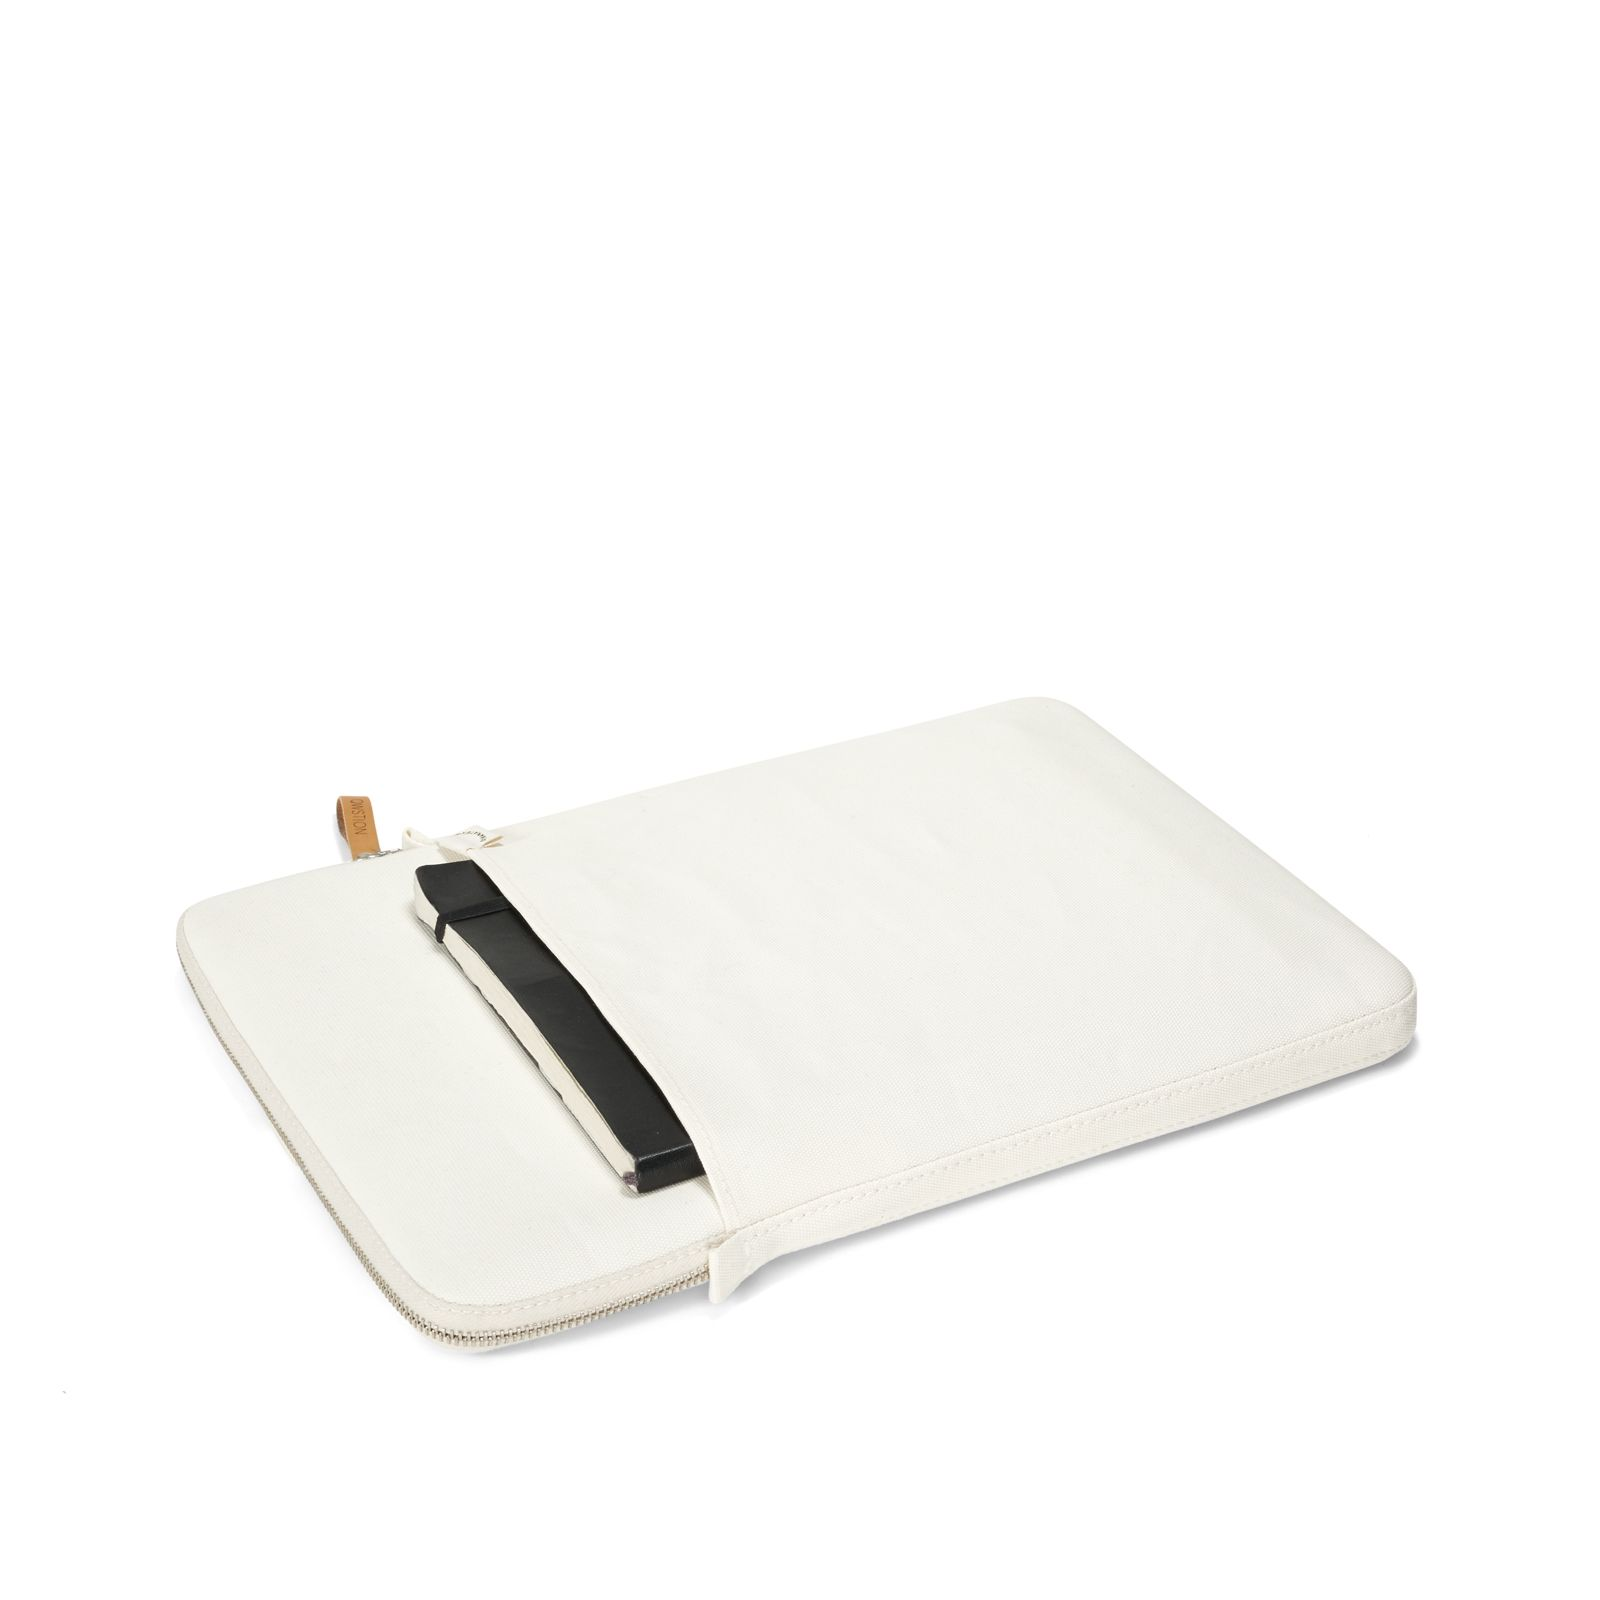 Bananatex Sleeve for Macbook 16